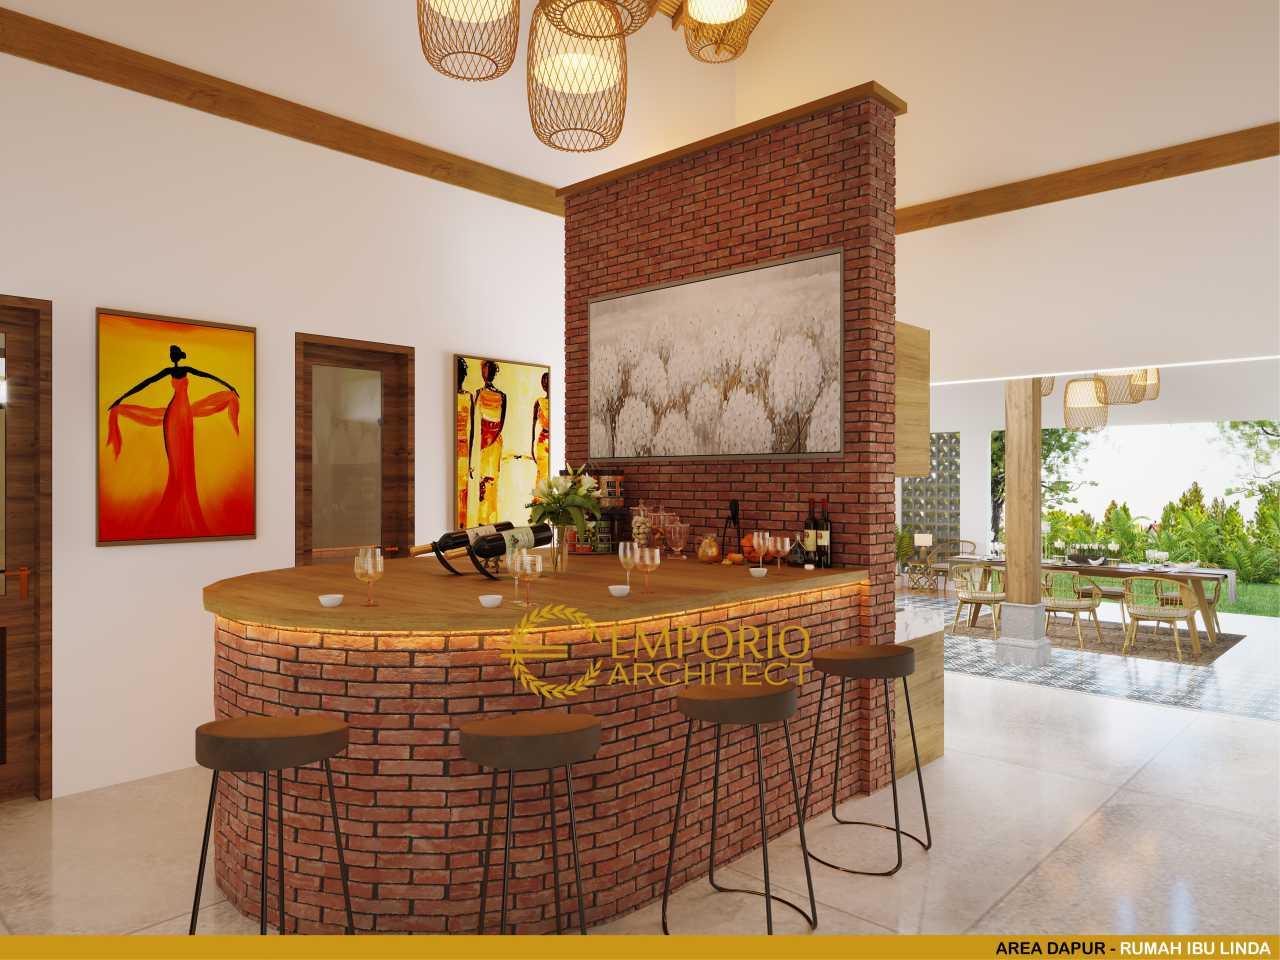 Ide Desain Interior Dapur Minimalis Sederhana Berkonsep ...